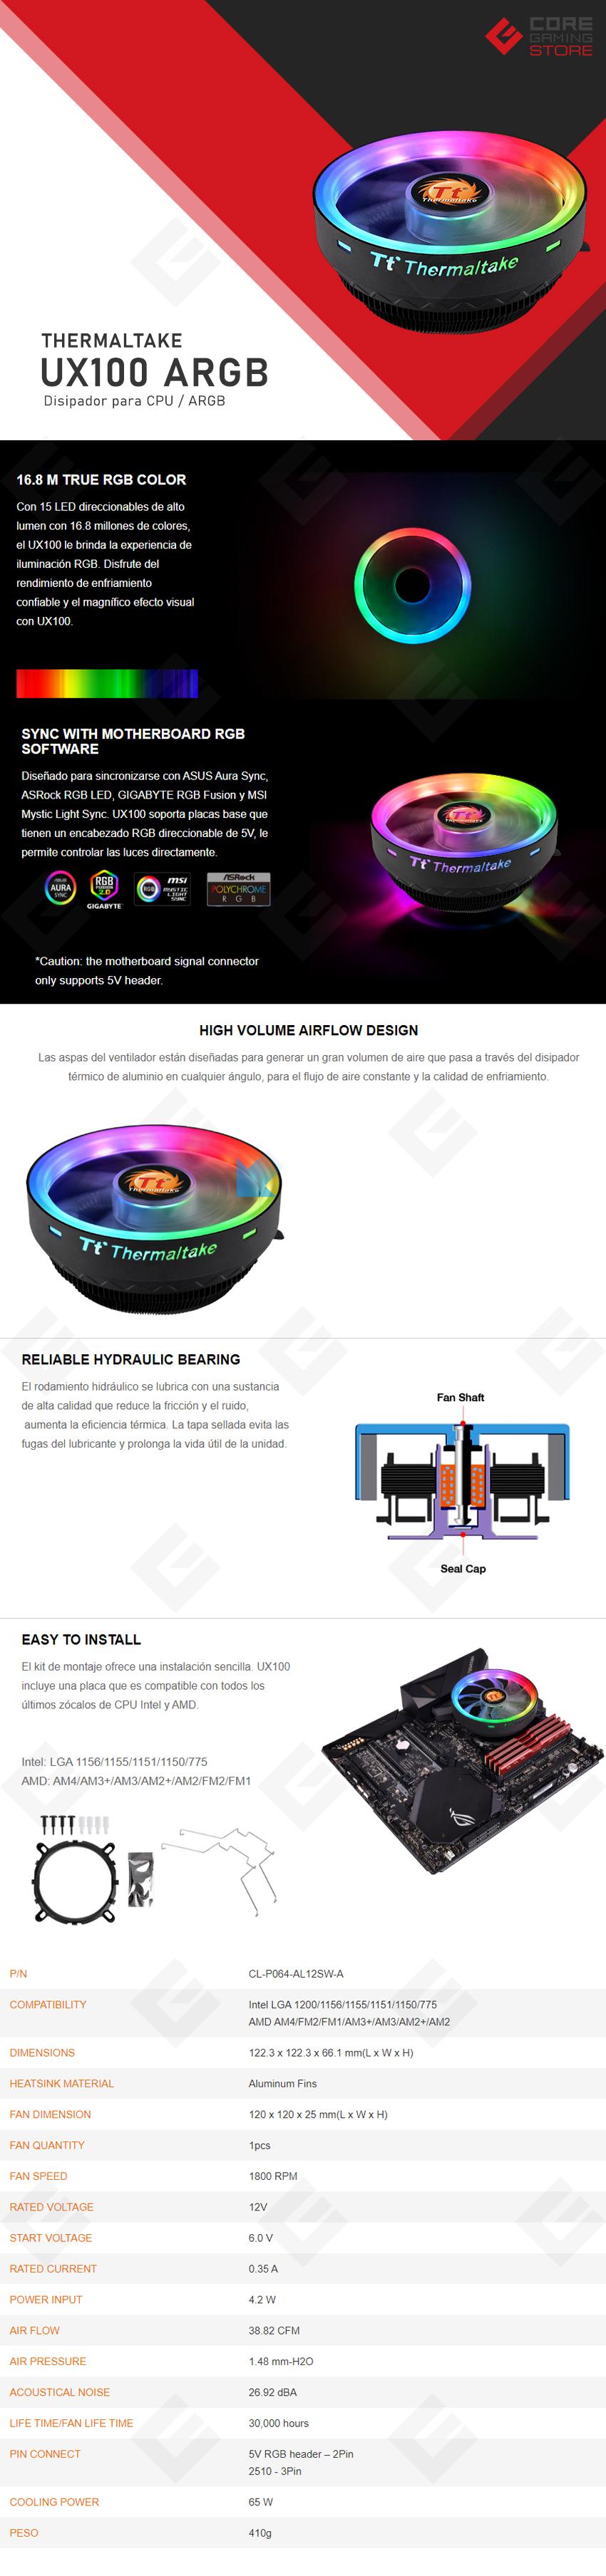 Disipador para CPU Thermaltake UX100 ARGB Lighting CPU Cooler - CL-P064-AL12SW-A